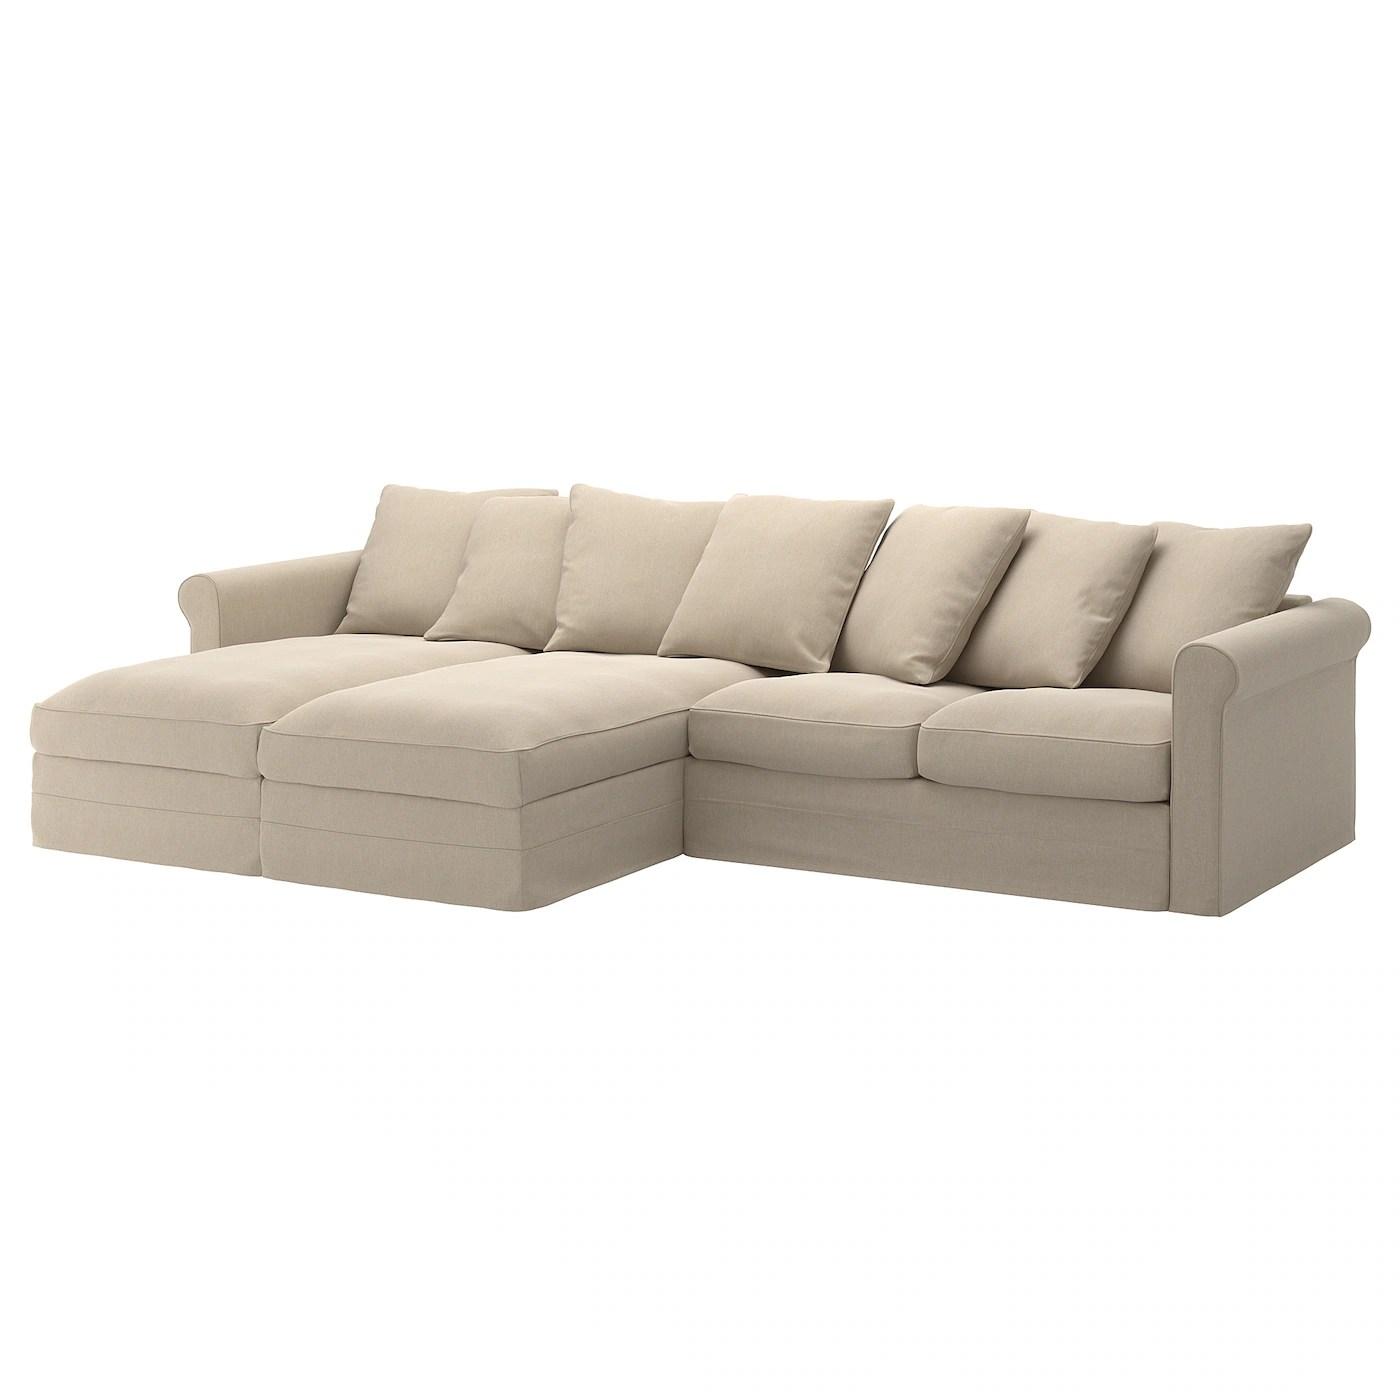 ikea rp 3 seater sofa covers como hacer cama para perros 4 vimle corner seat gräsbo black ...